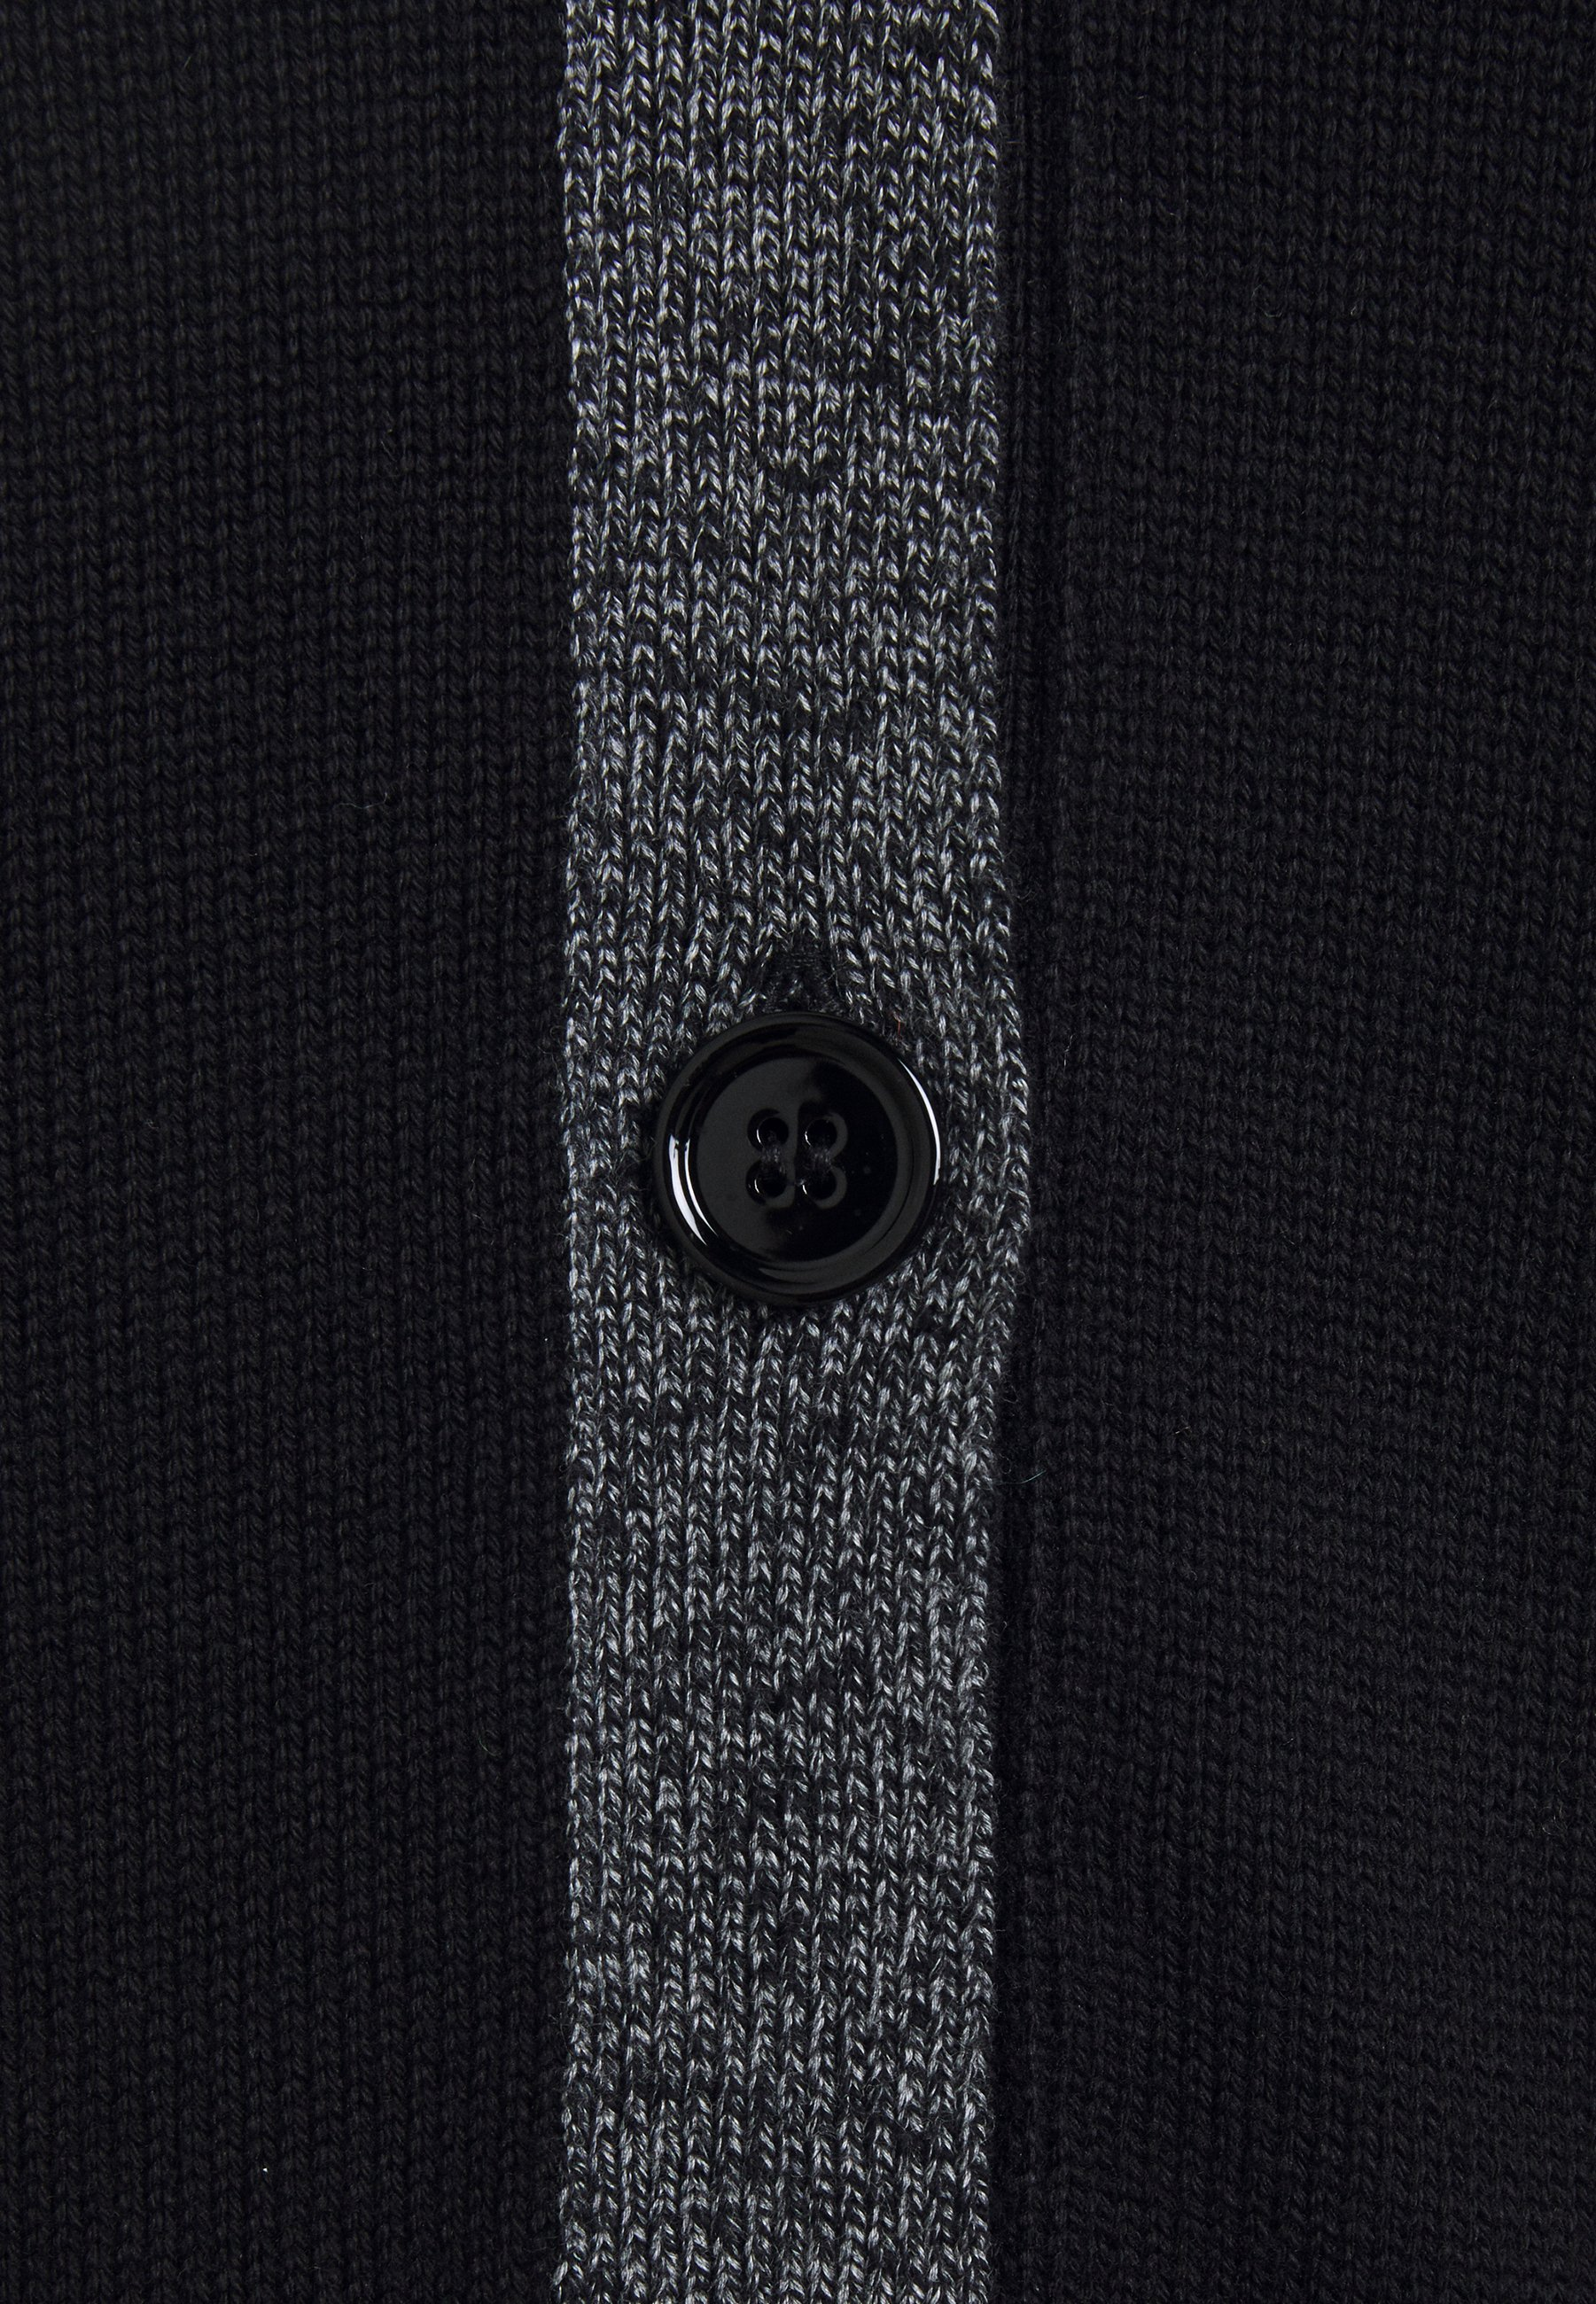 MM6 Maison Margiela Vest - black/grey - Dames jas Opruiming